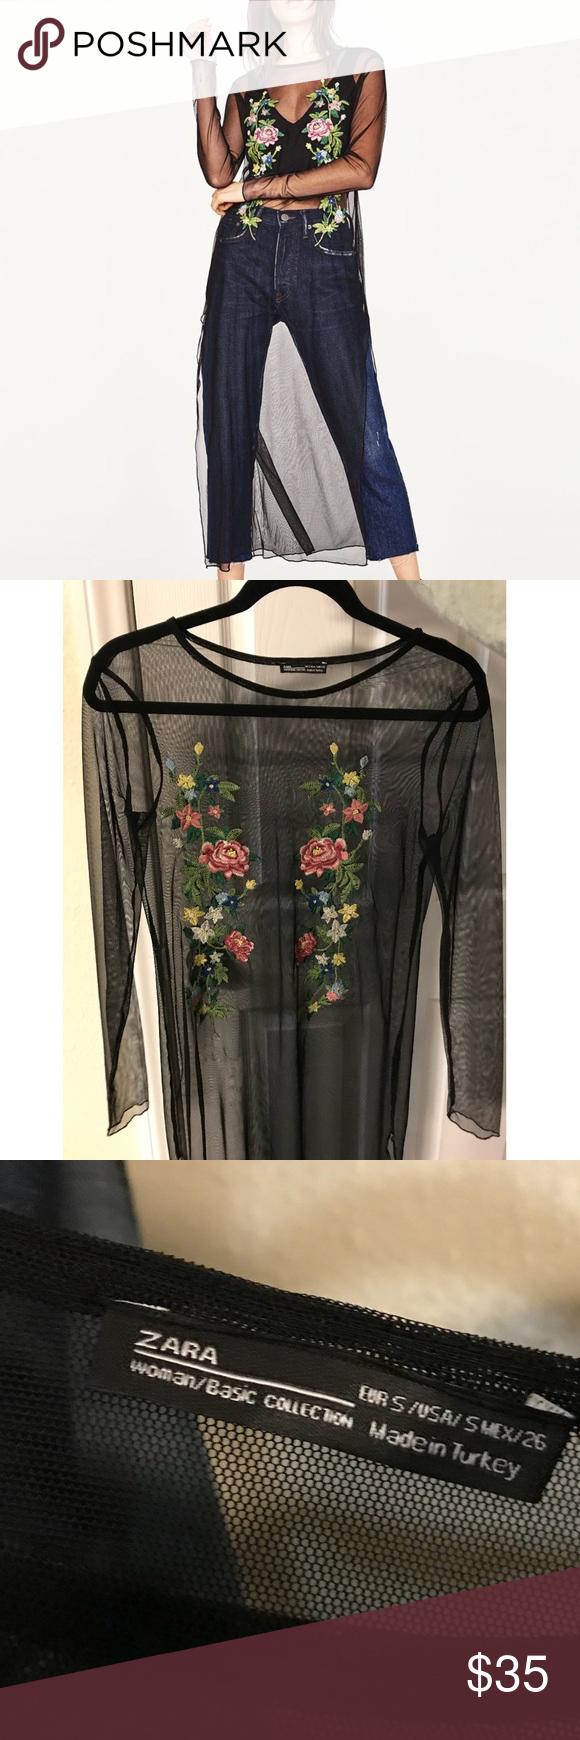 Nwot mesh floral dress zara dresses overlay and zara black